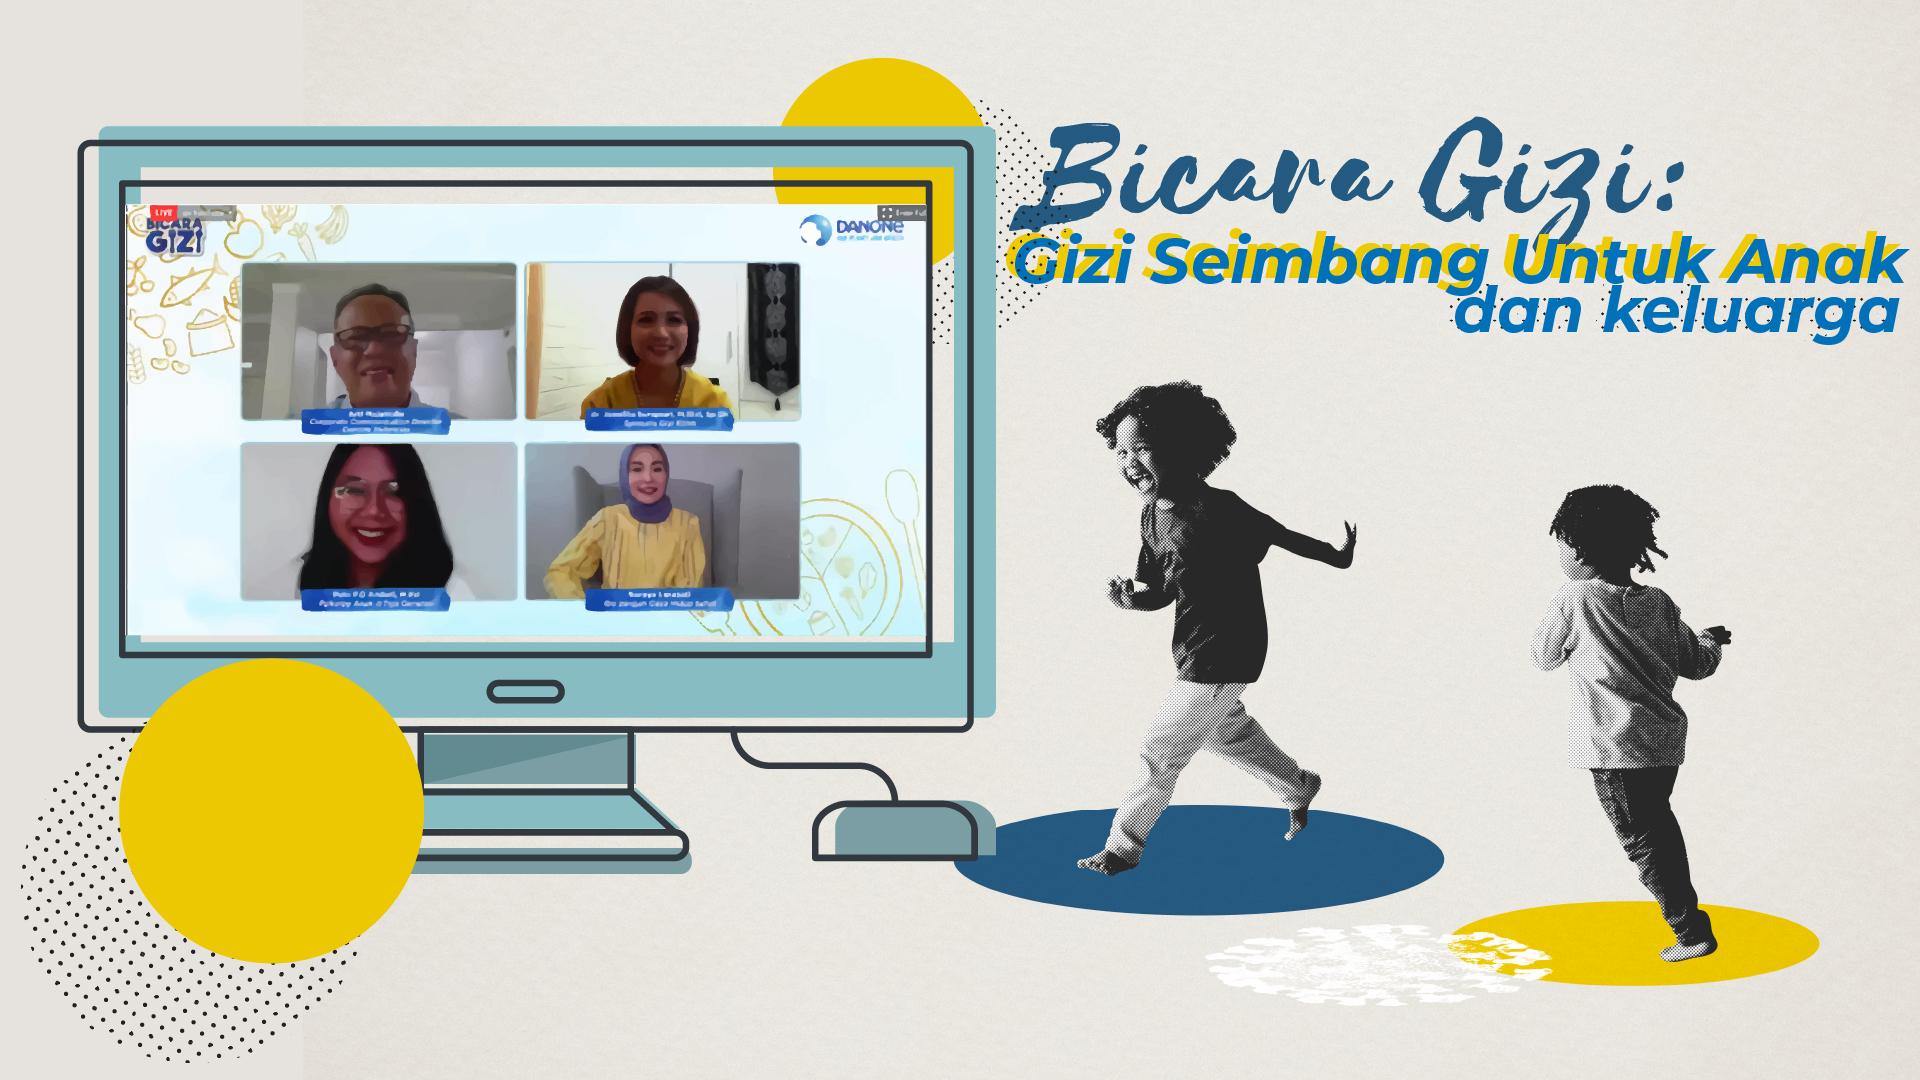 Webinar Bicara Gizi: Gizi Seimbang Danone